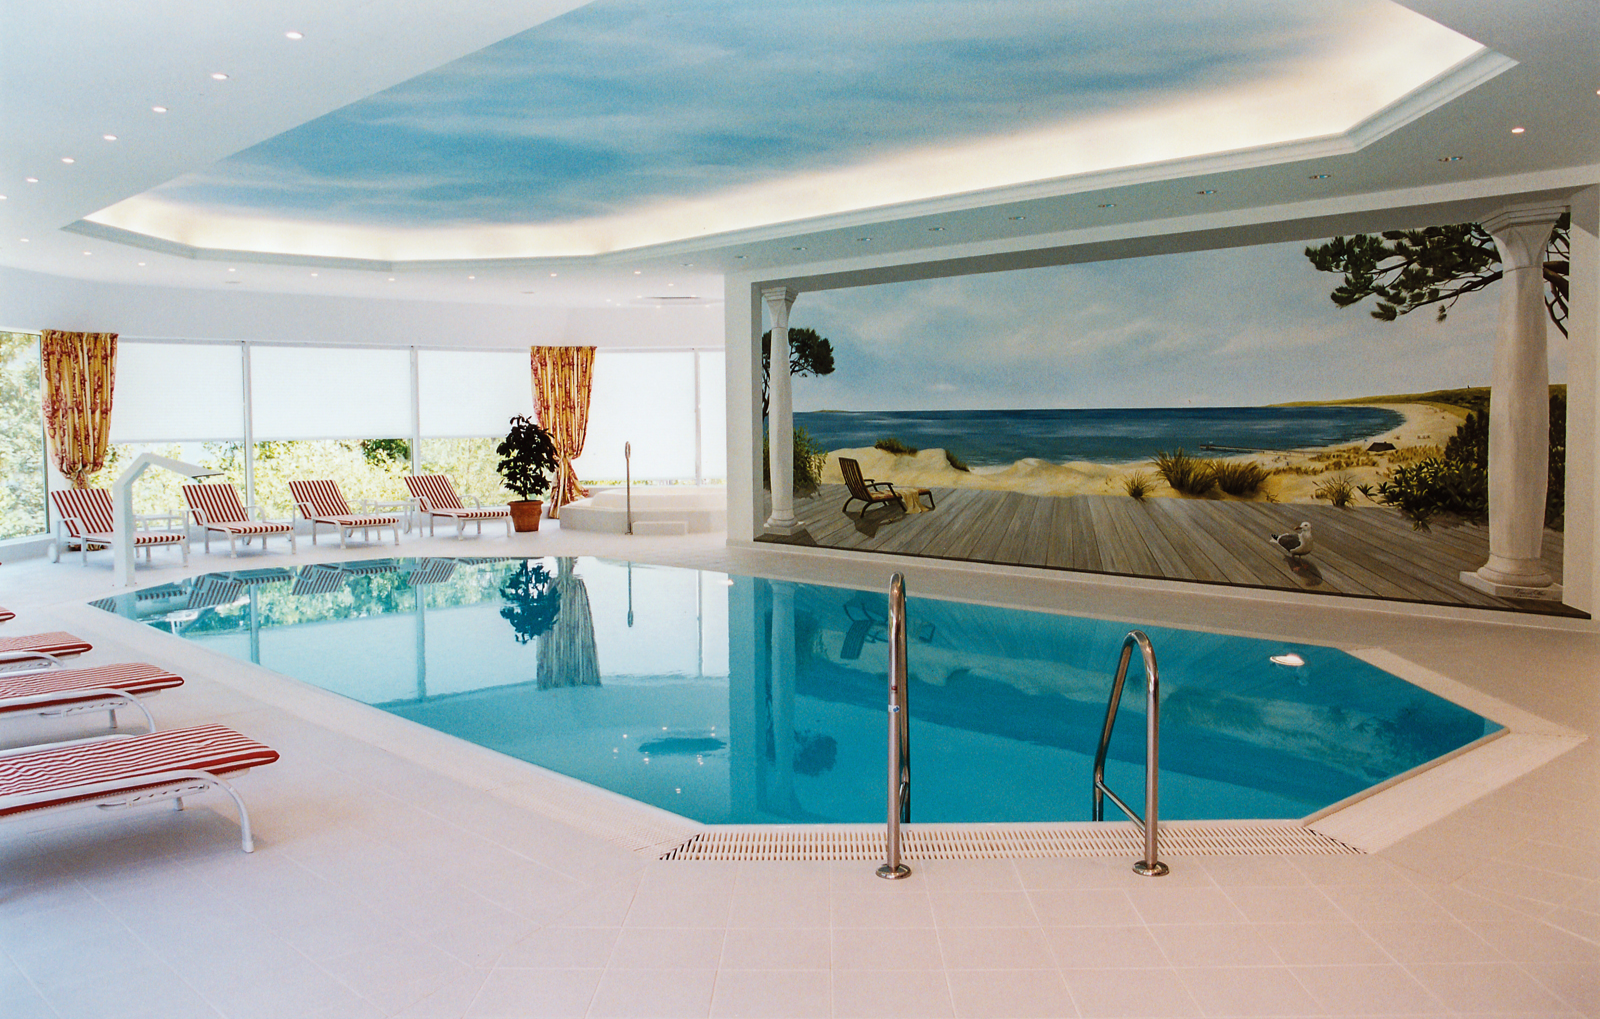 einfach-mal-urlaub-de-parkhotel-am-glienberg-bg4